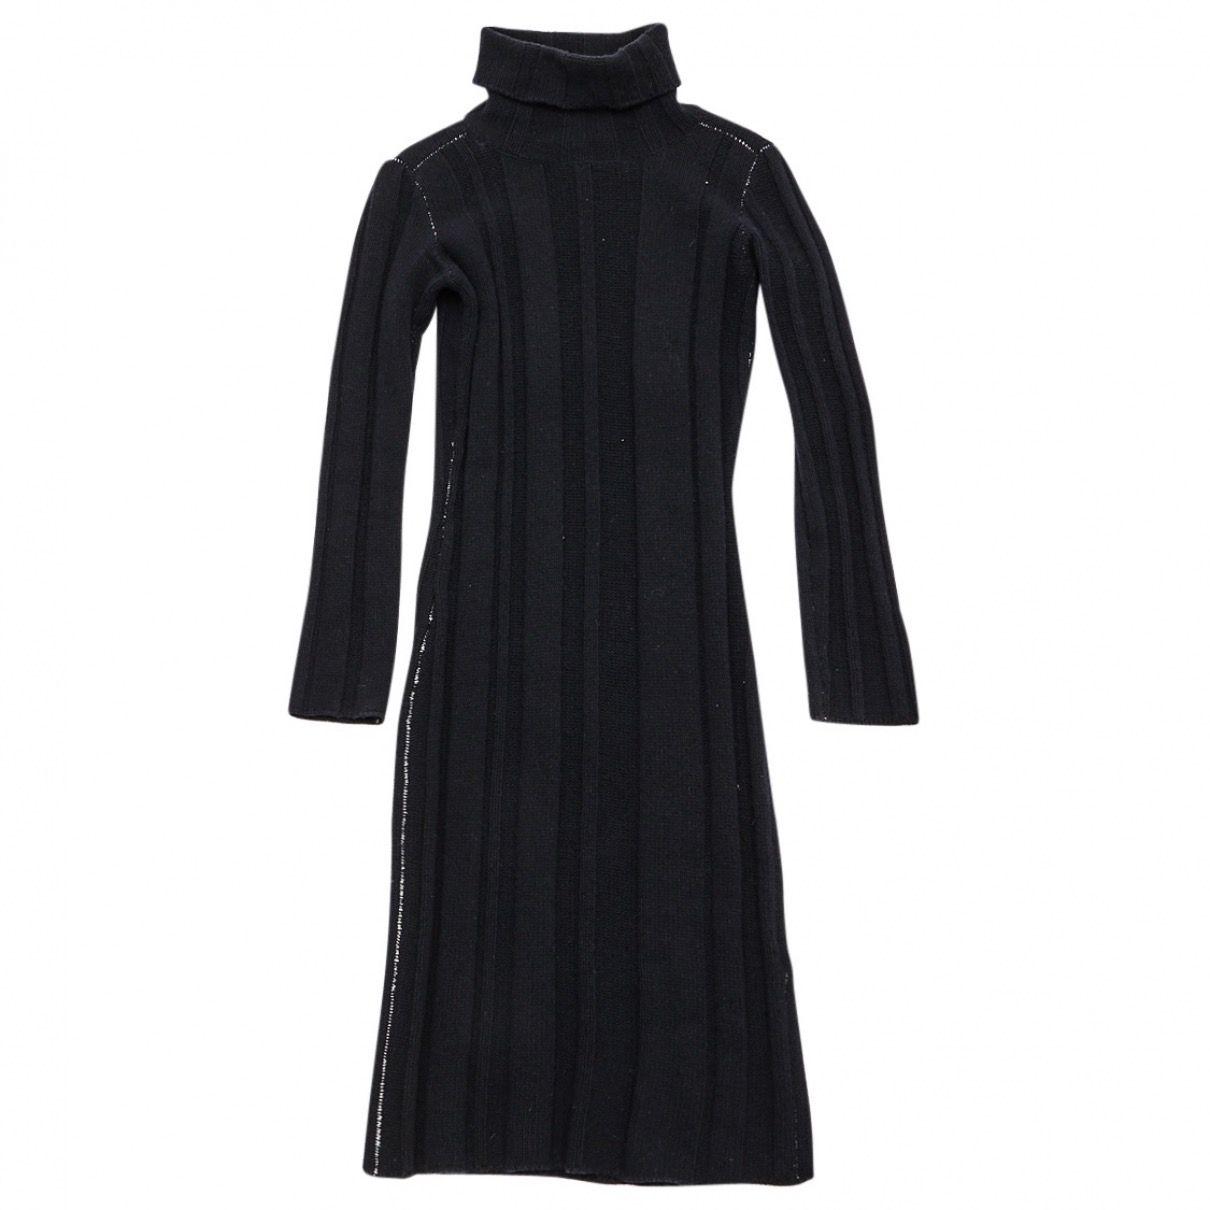 Cheap Finishline Cheap Best Prices Maison Margiela Woman Satin-jacquard Wrap Maxi Dress Black Size 40 Maison Martin Margiela Cheap 100% Guaranteed Outlet Latest Free Shipping Online hxMn7Bnr